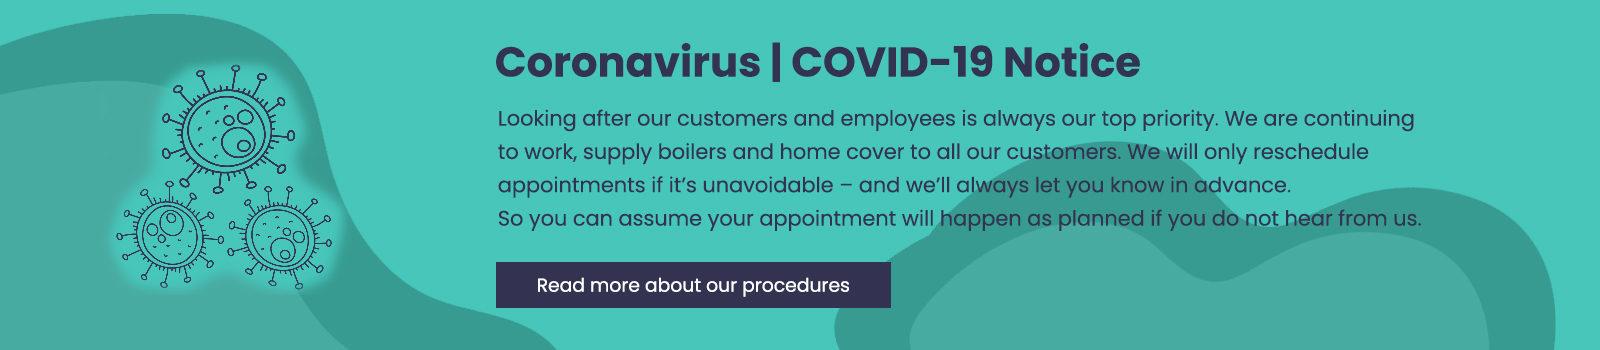 Coronavirus Concerns